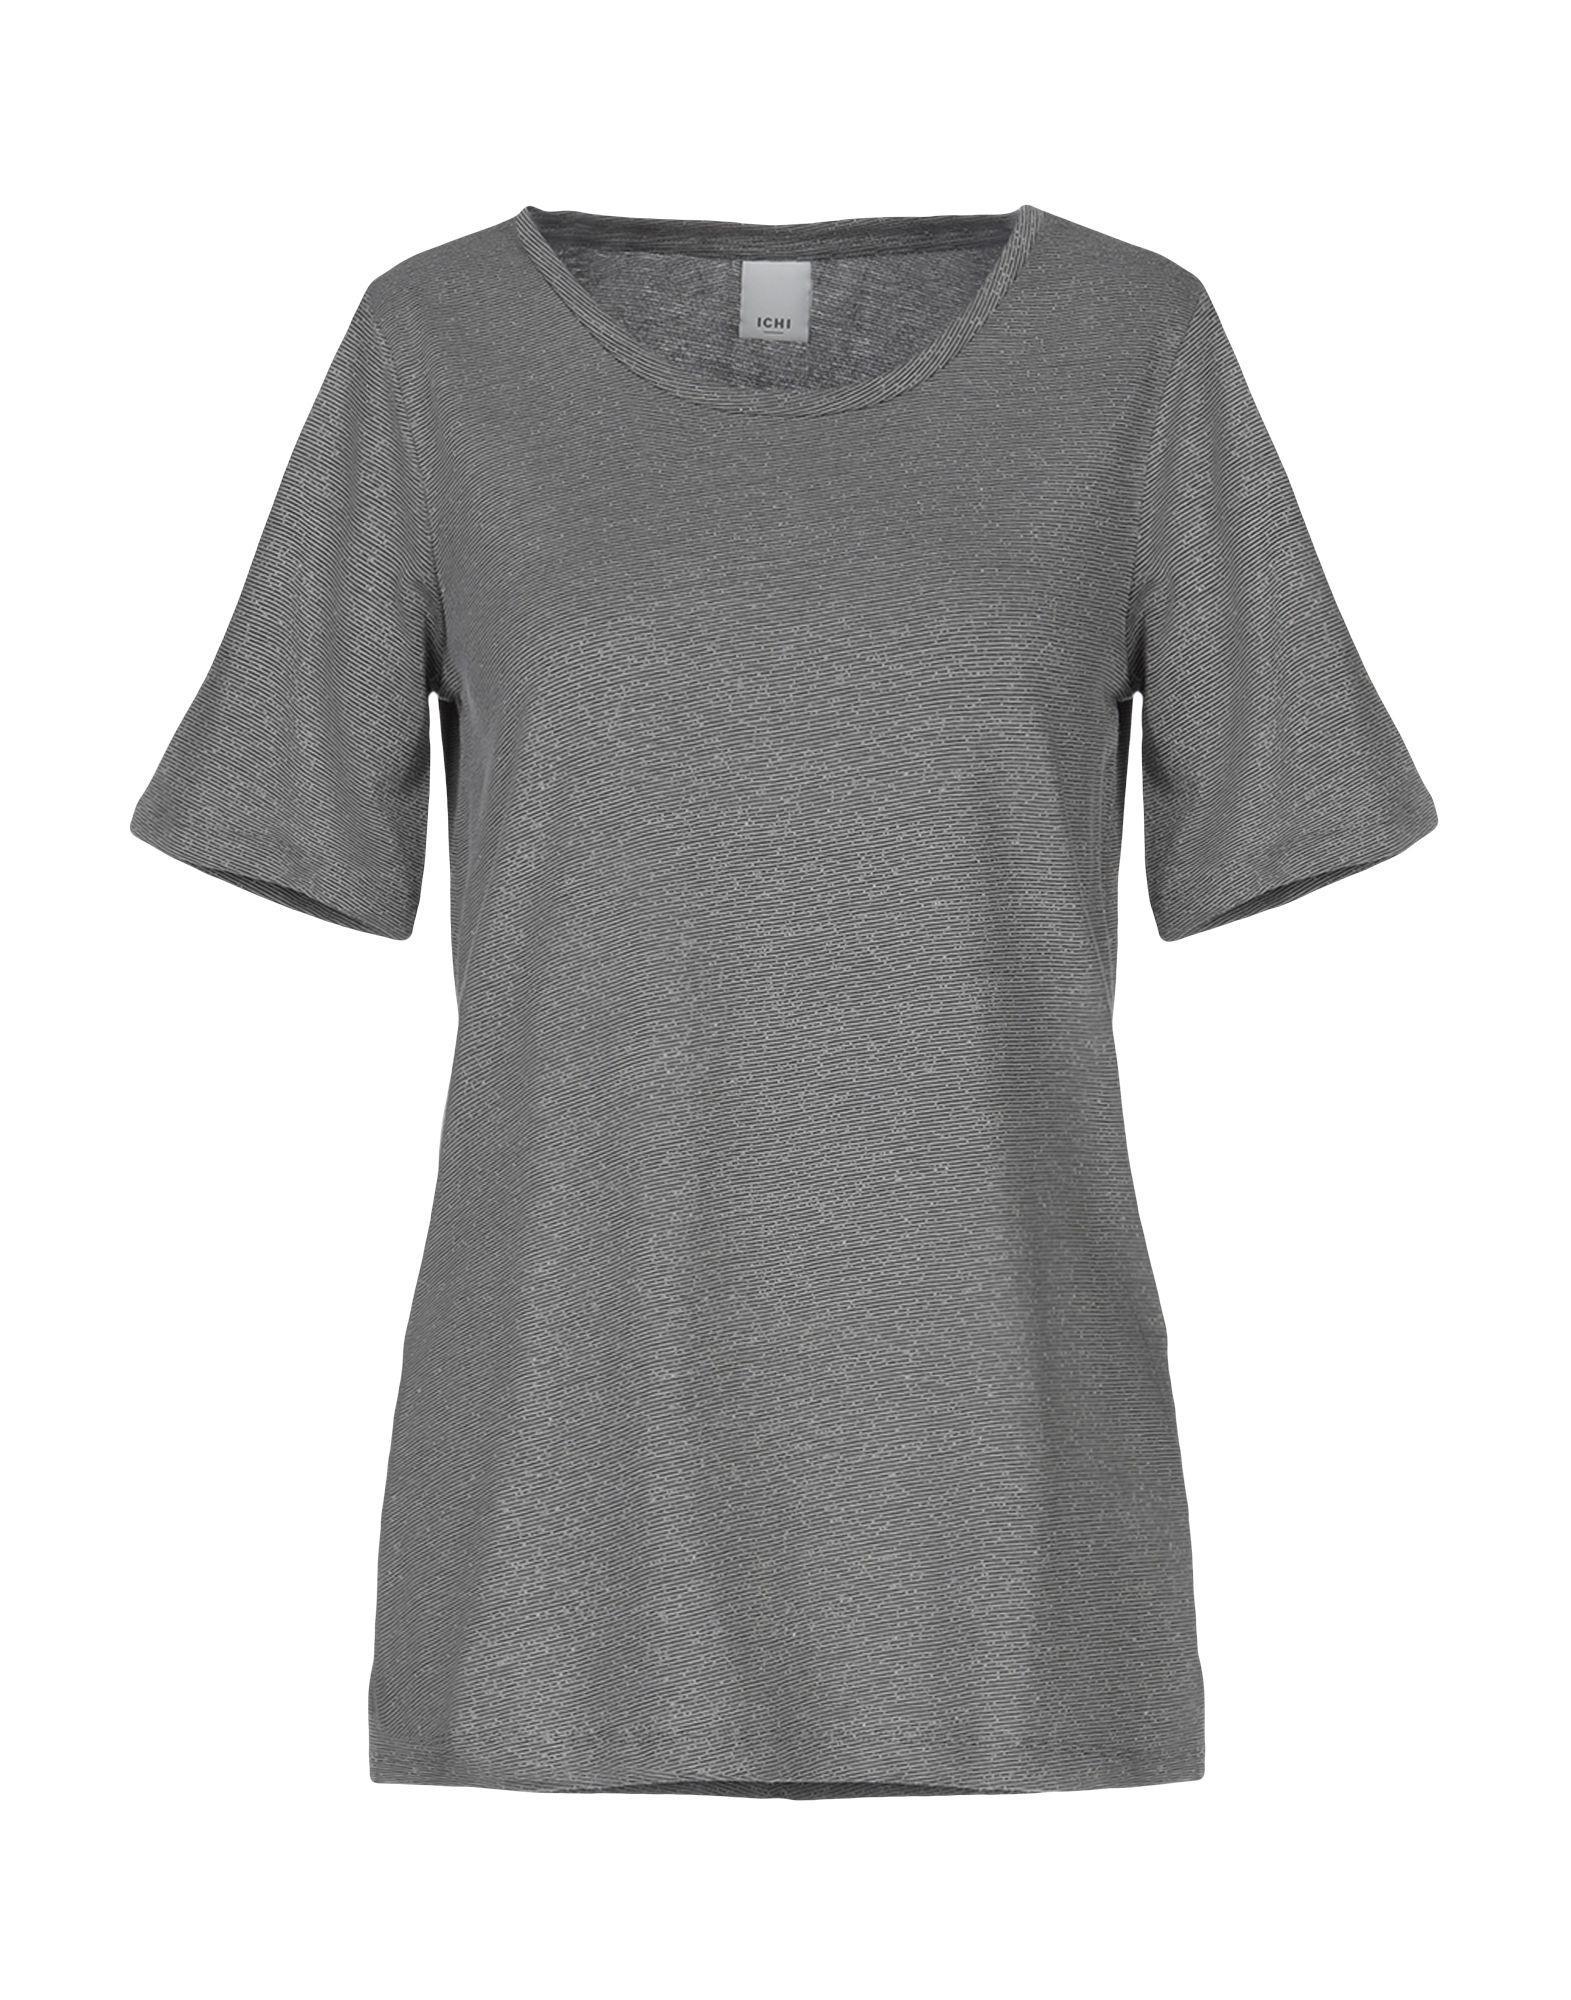 7b7f58678349 Ichi - Gray T-shirt - Lyst. View fullscreen